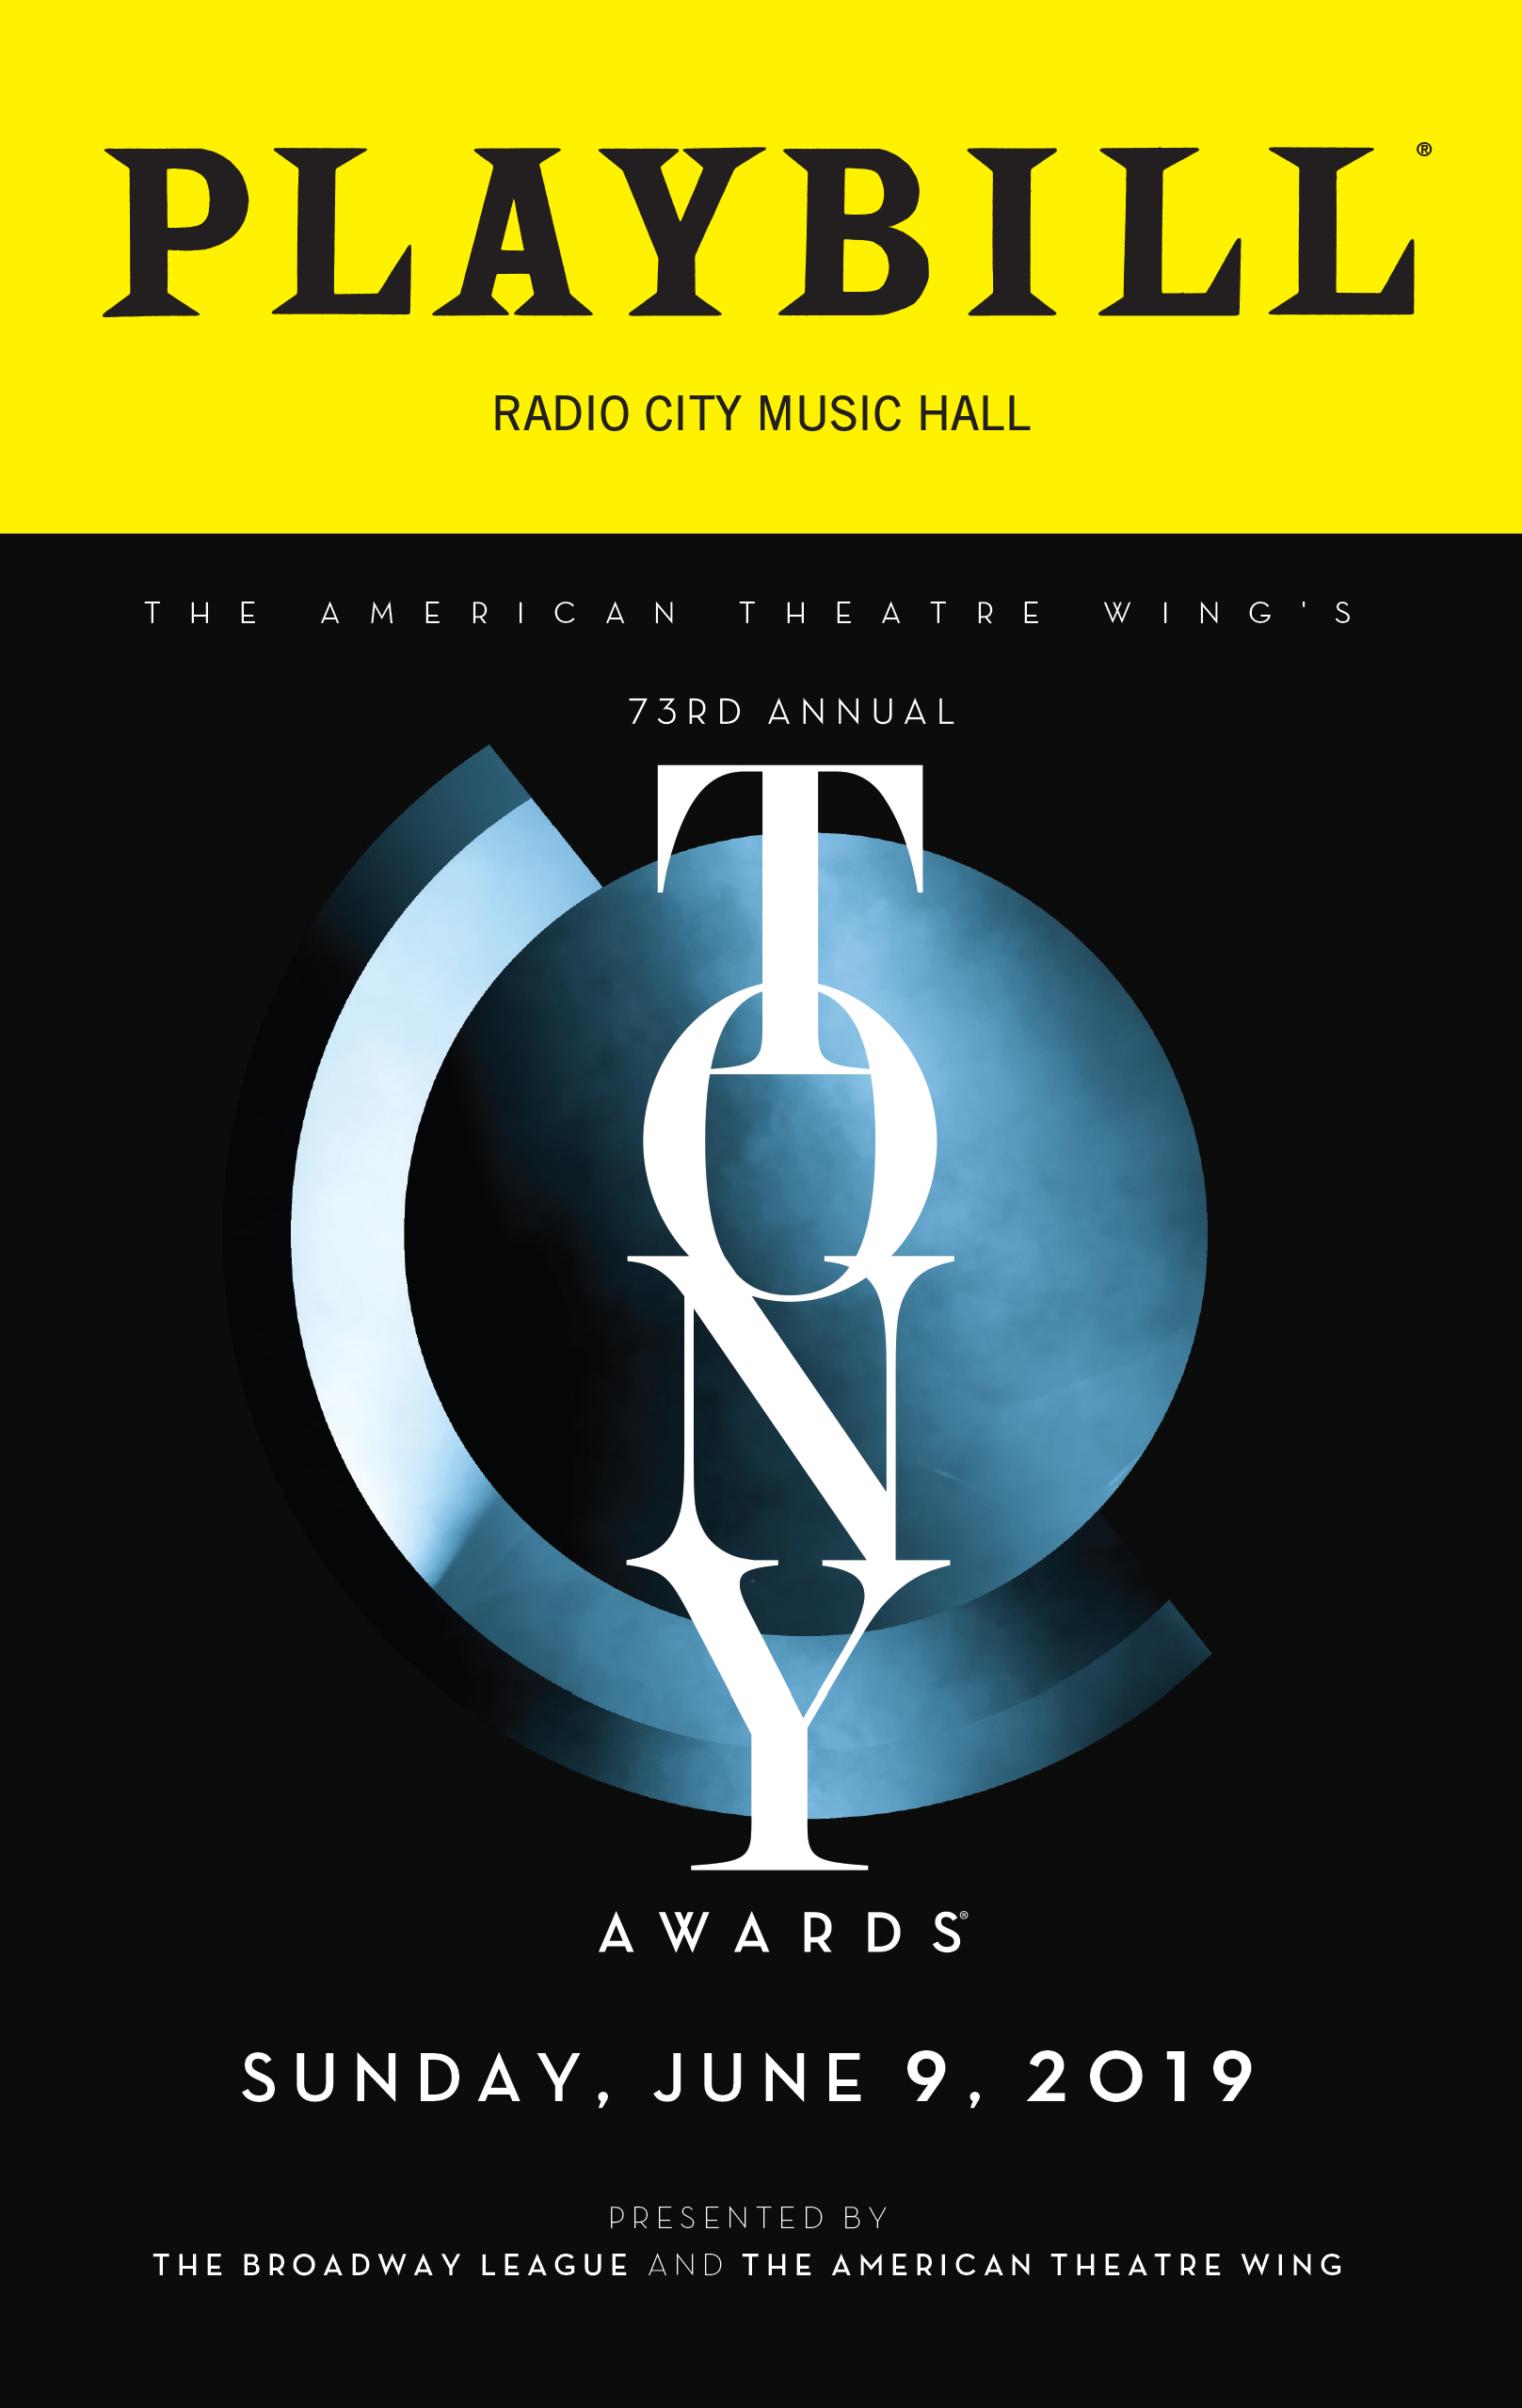 The 2019 Tony Awards Playbill Playbill Merchandise